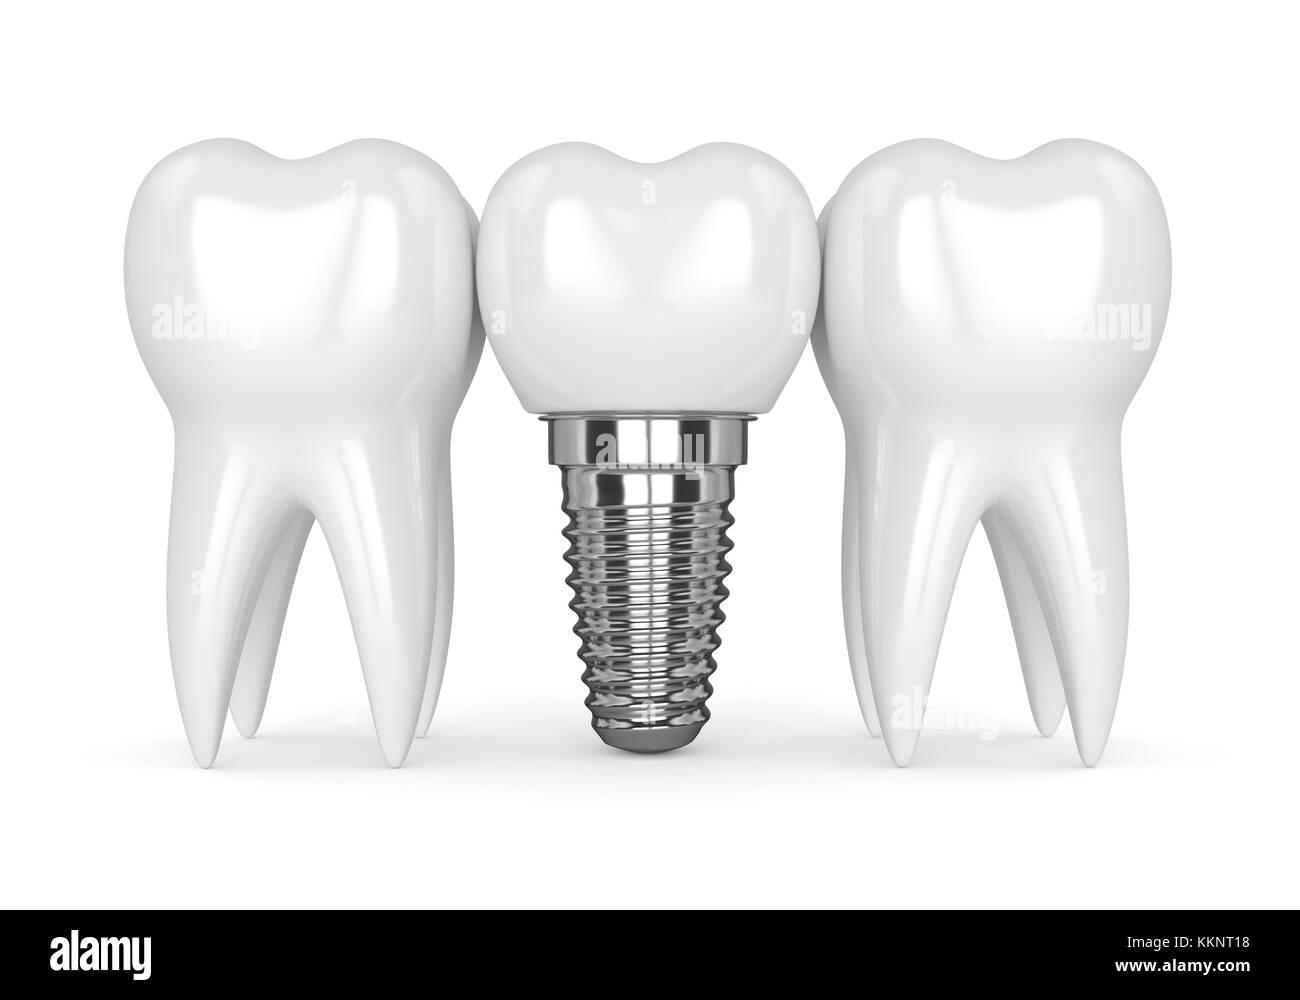 Implant Black and White Stock Photos & Images - Alamy Dental Implant Background